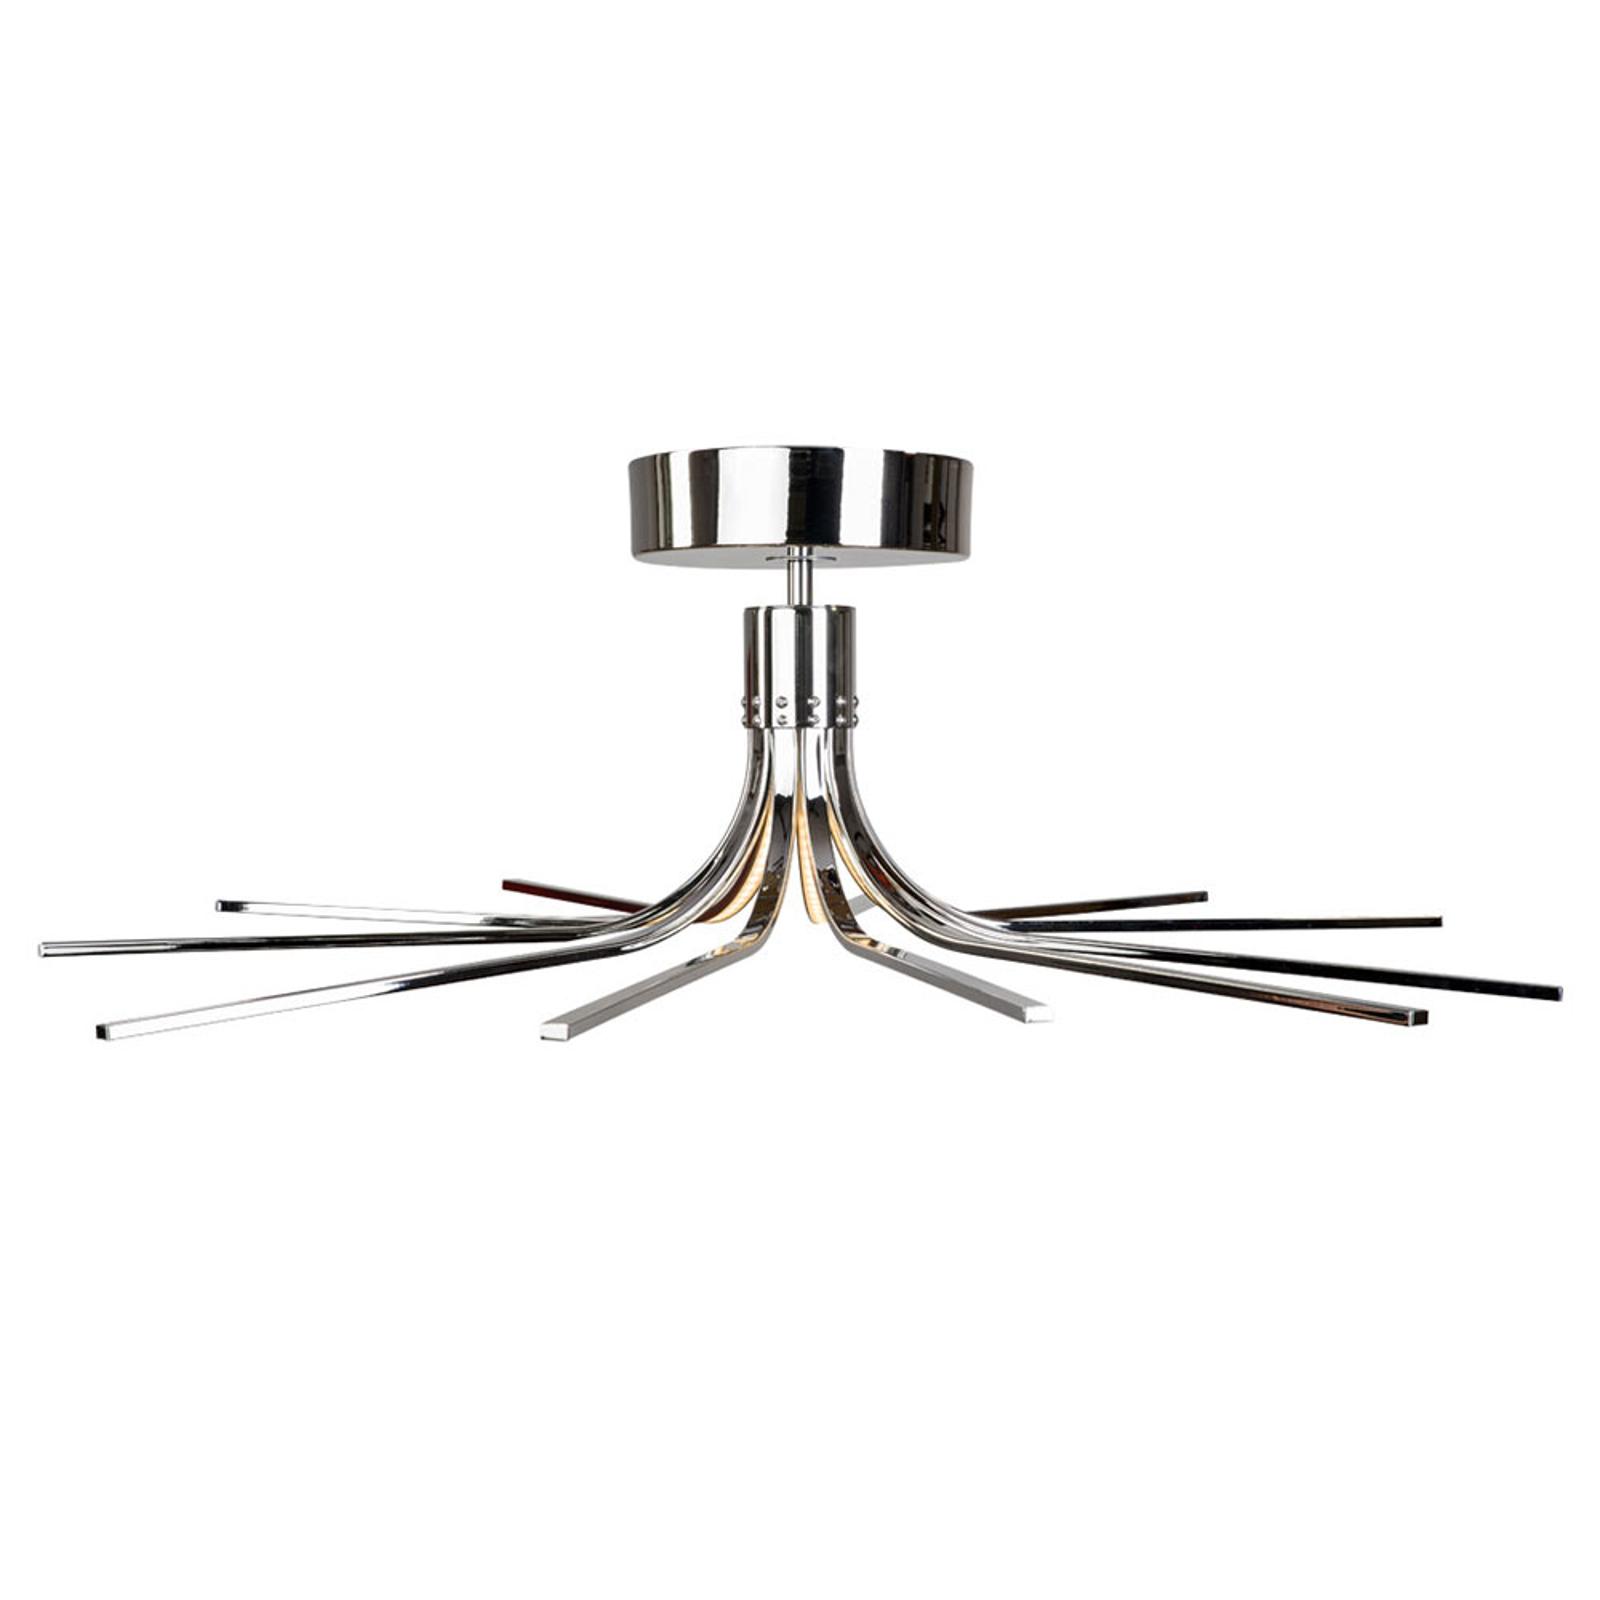 Lampa sufitowa LED Torino chrom Ø 78 cm